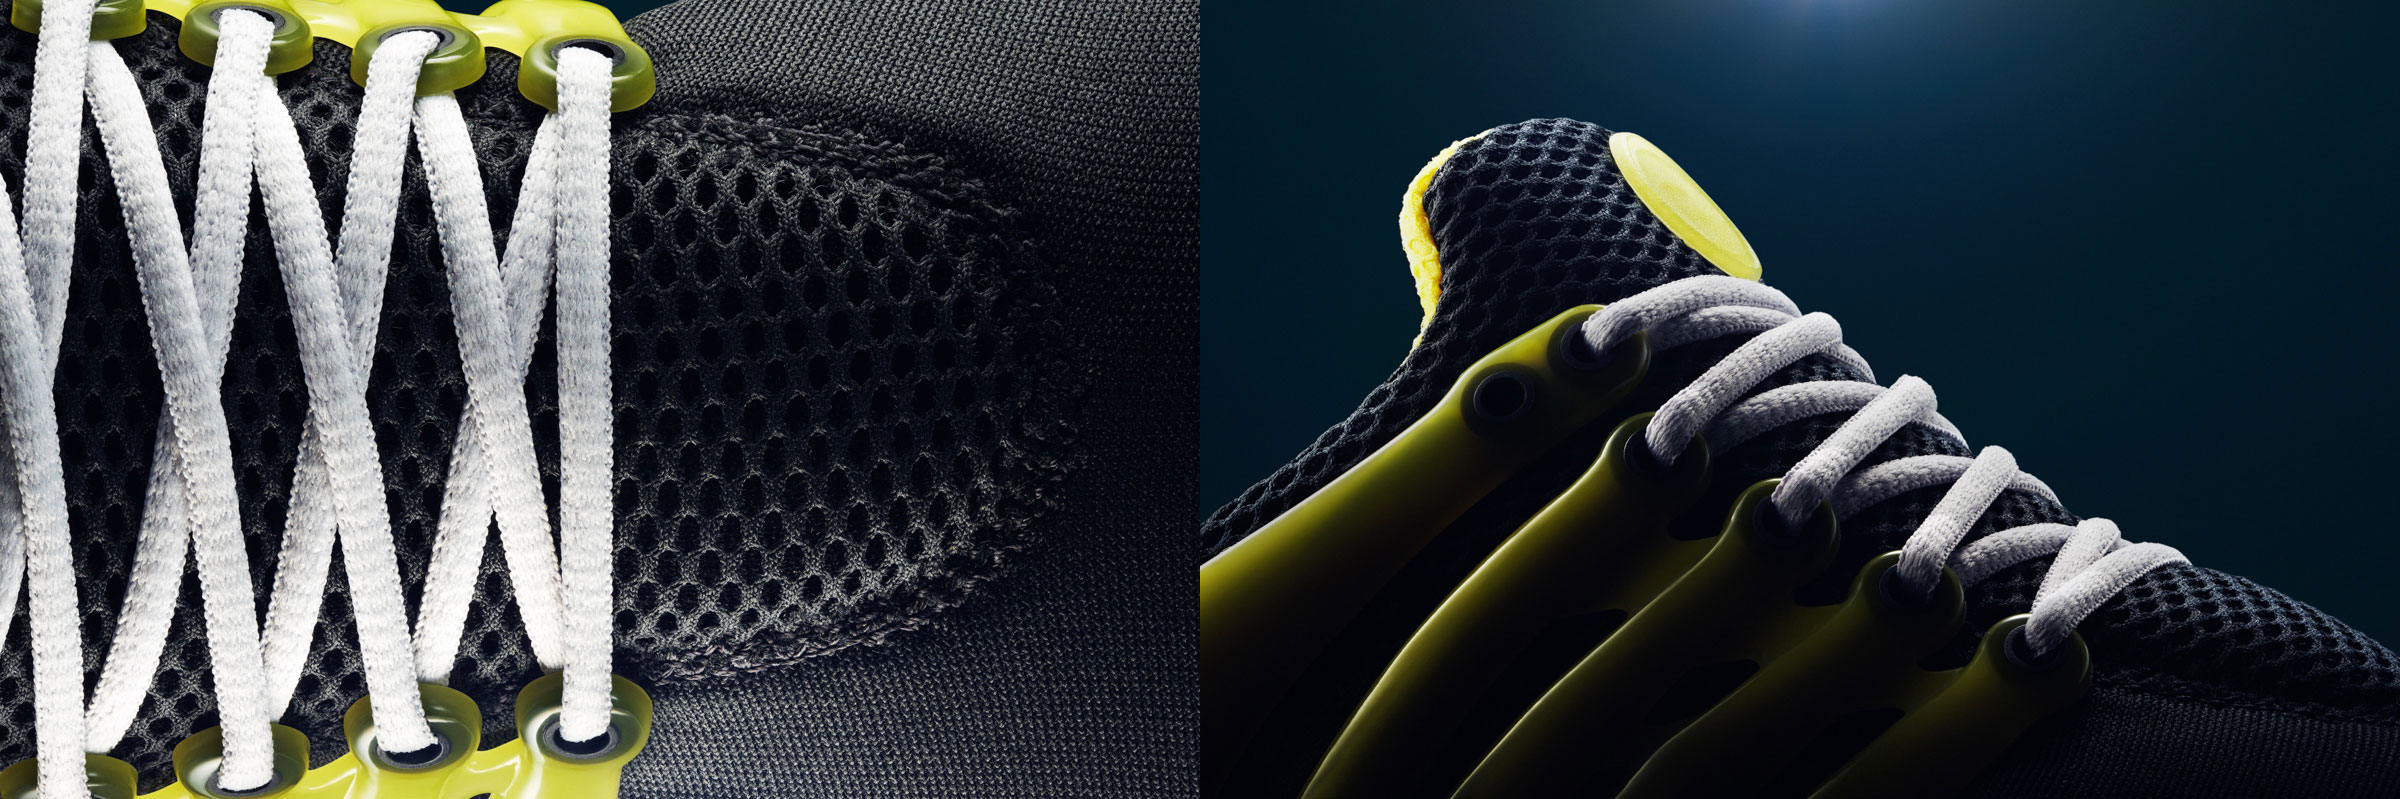 ec9eba39606d31 Genealogy of Nike Free